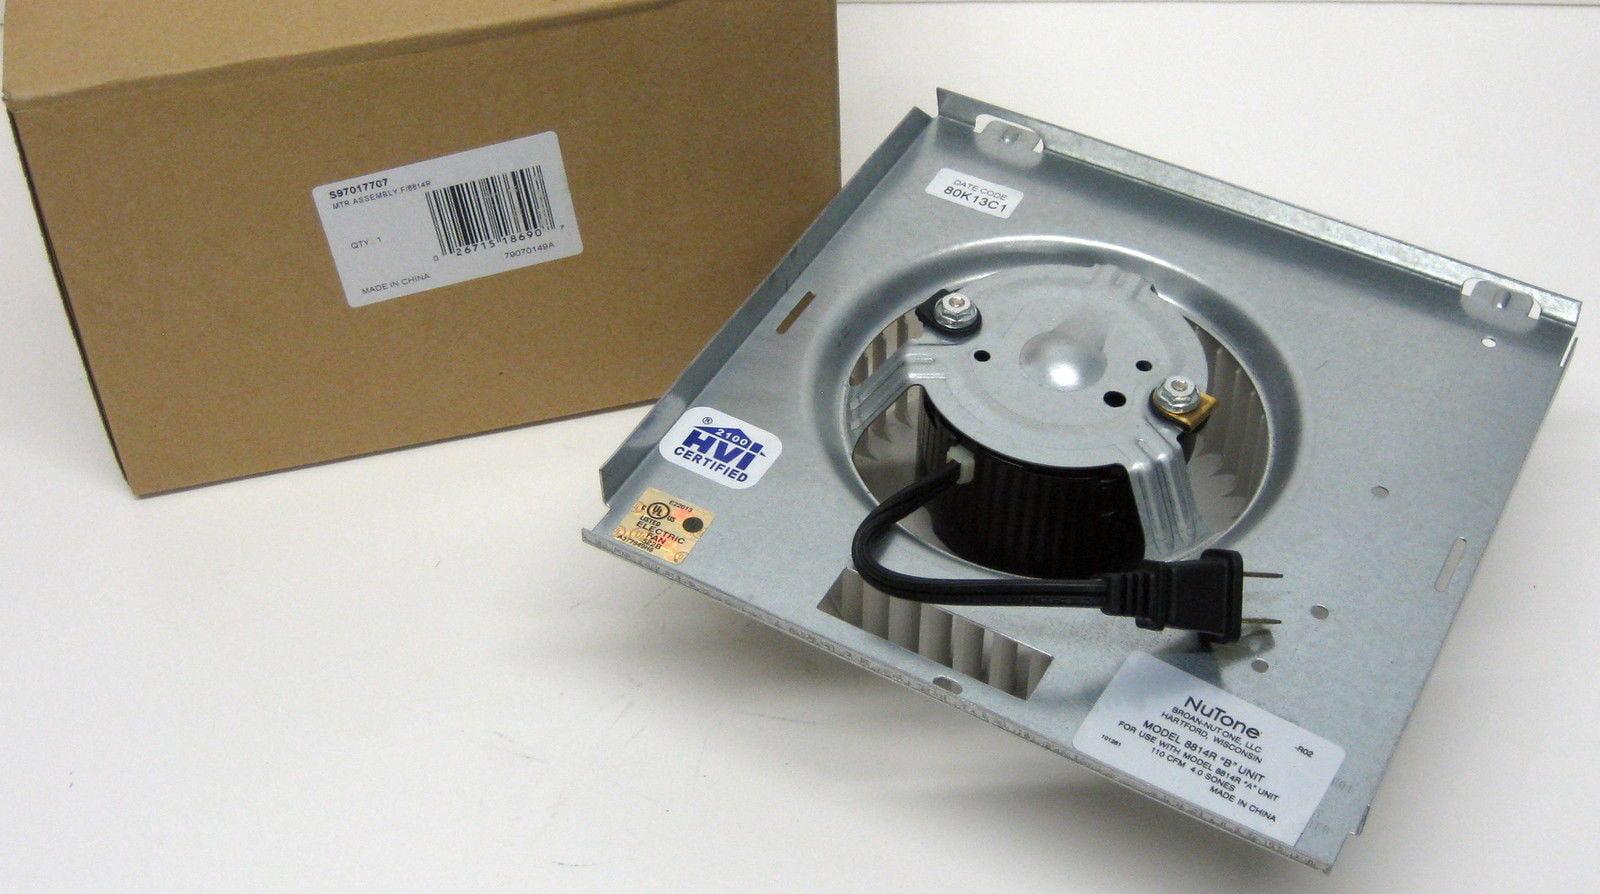 S 97017707 Broan Nutone Motor U0026 Blower Wheel For 8814R B   Walmart.com